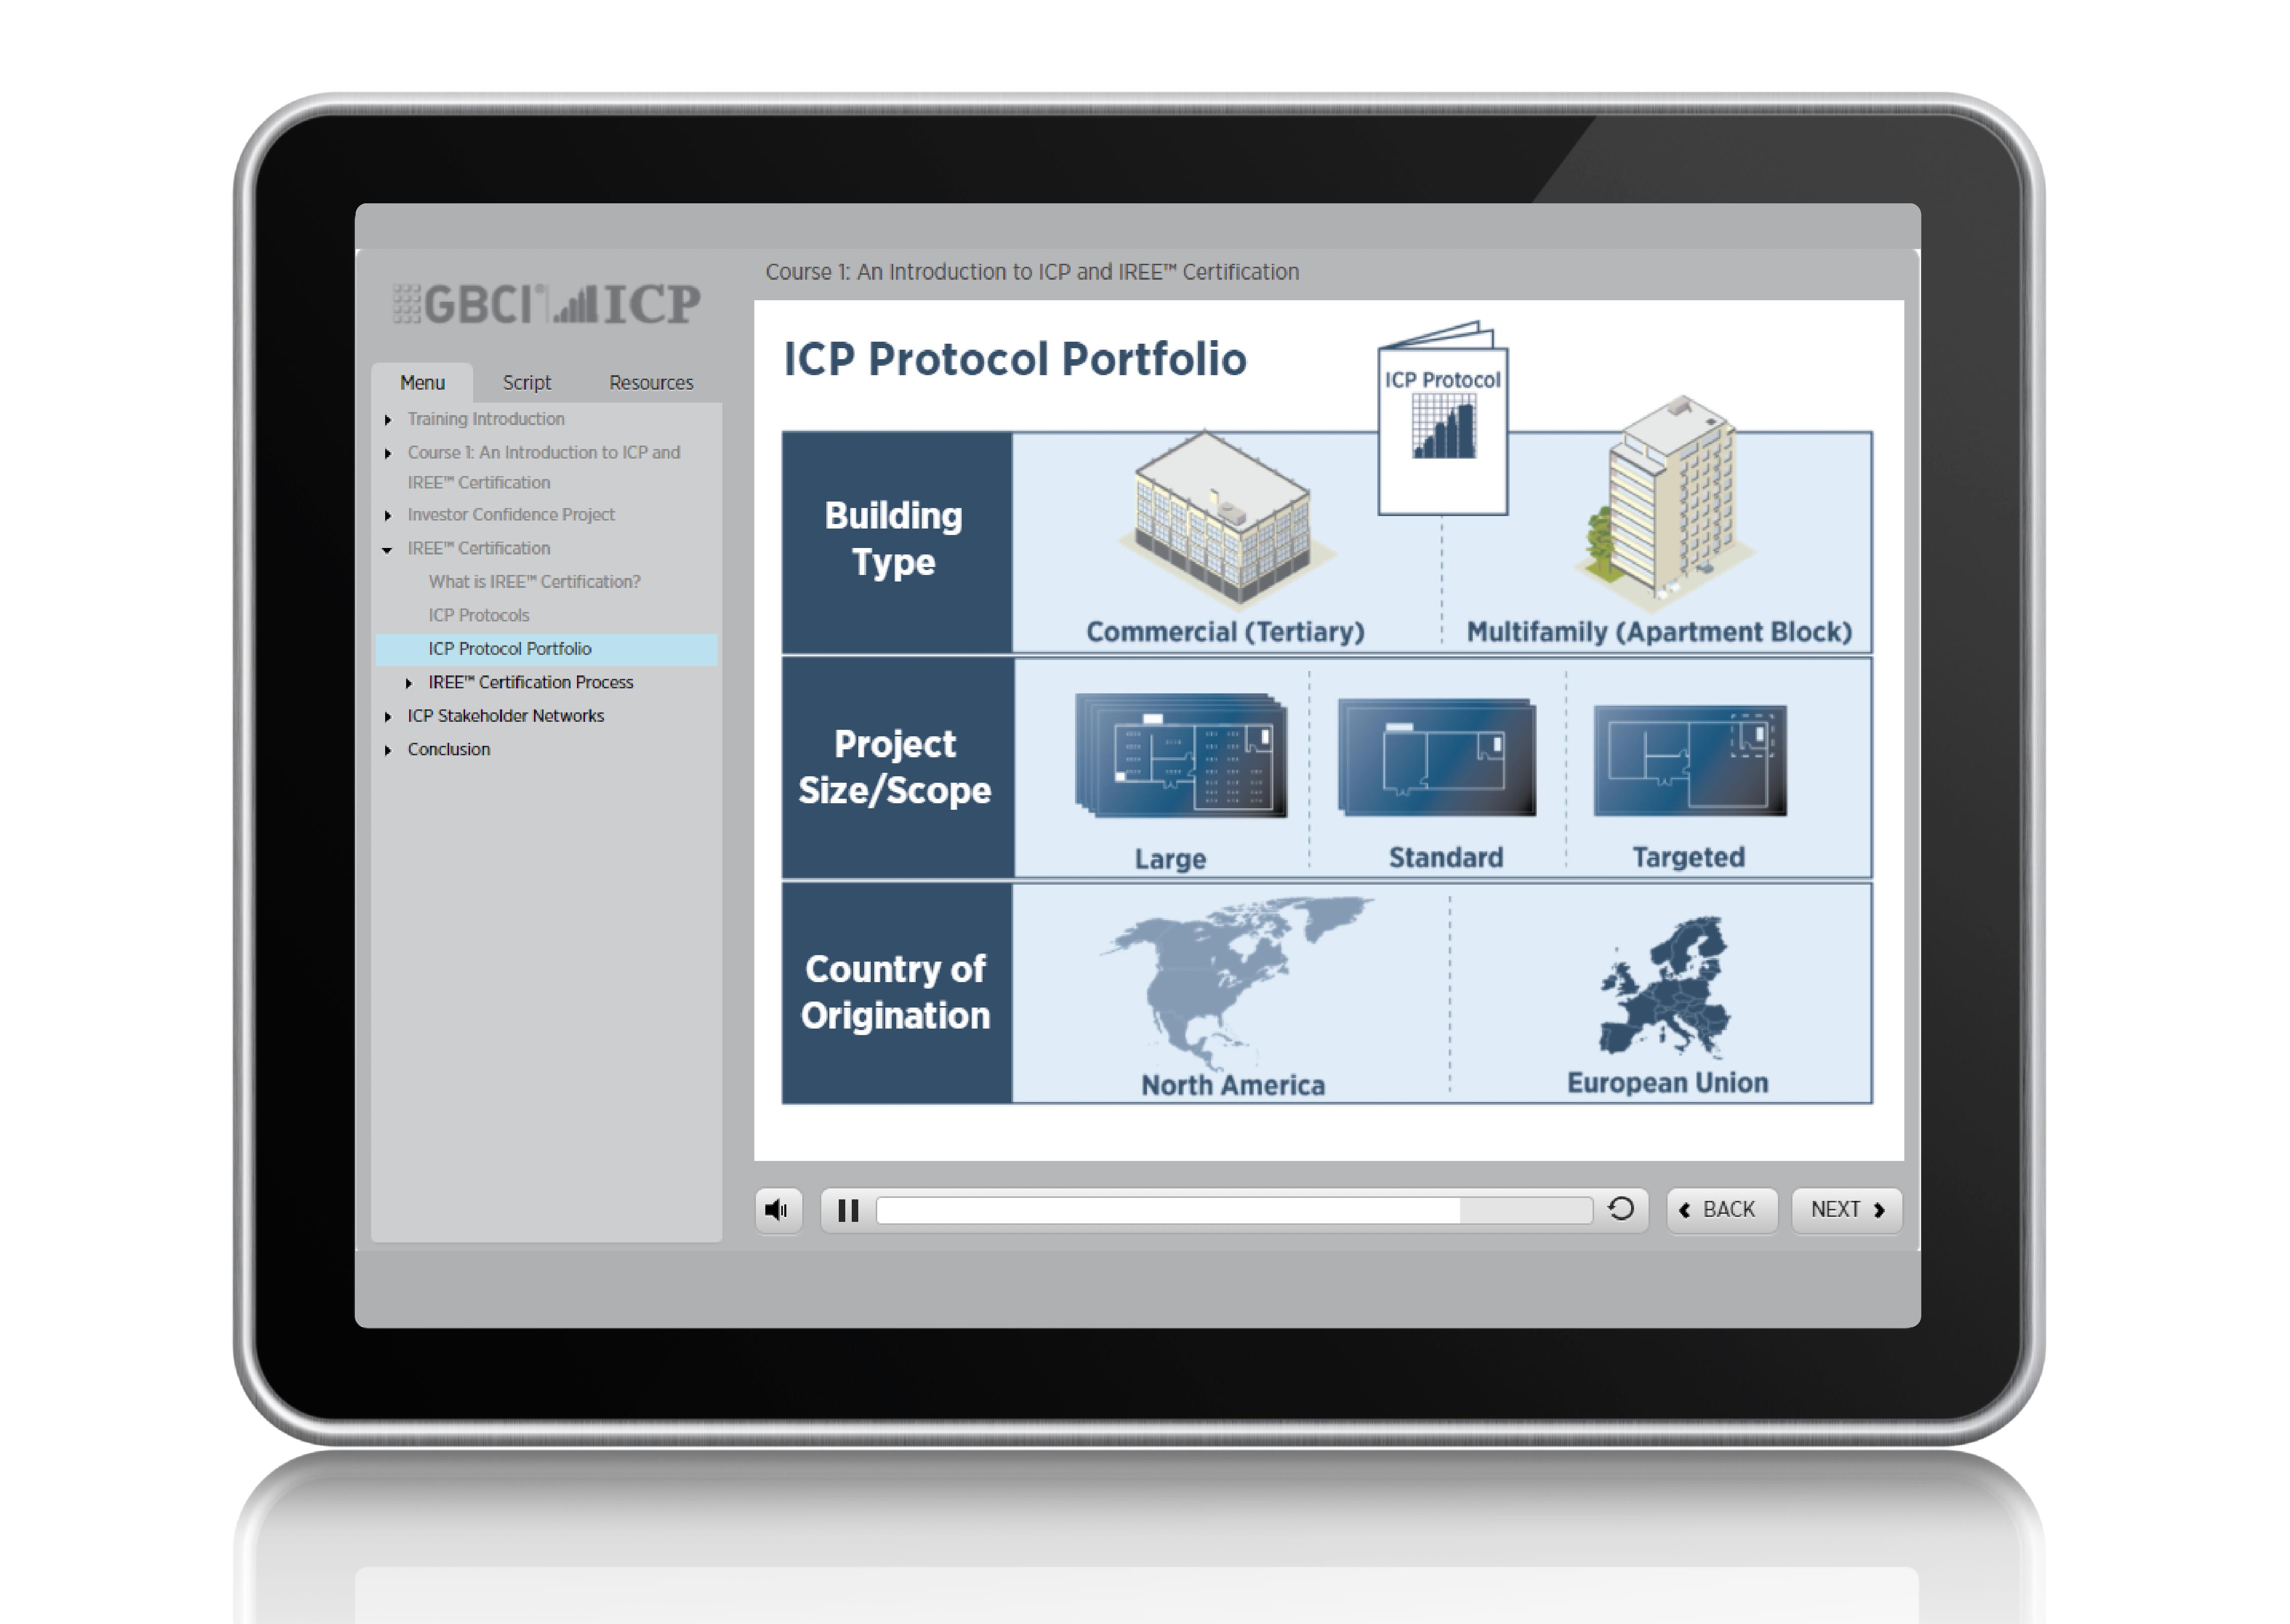 ICP Protocols